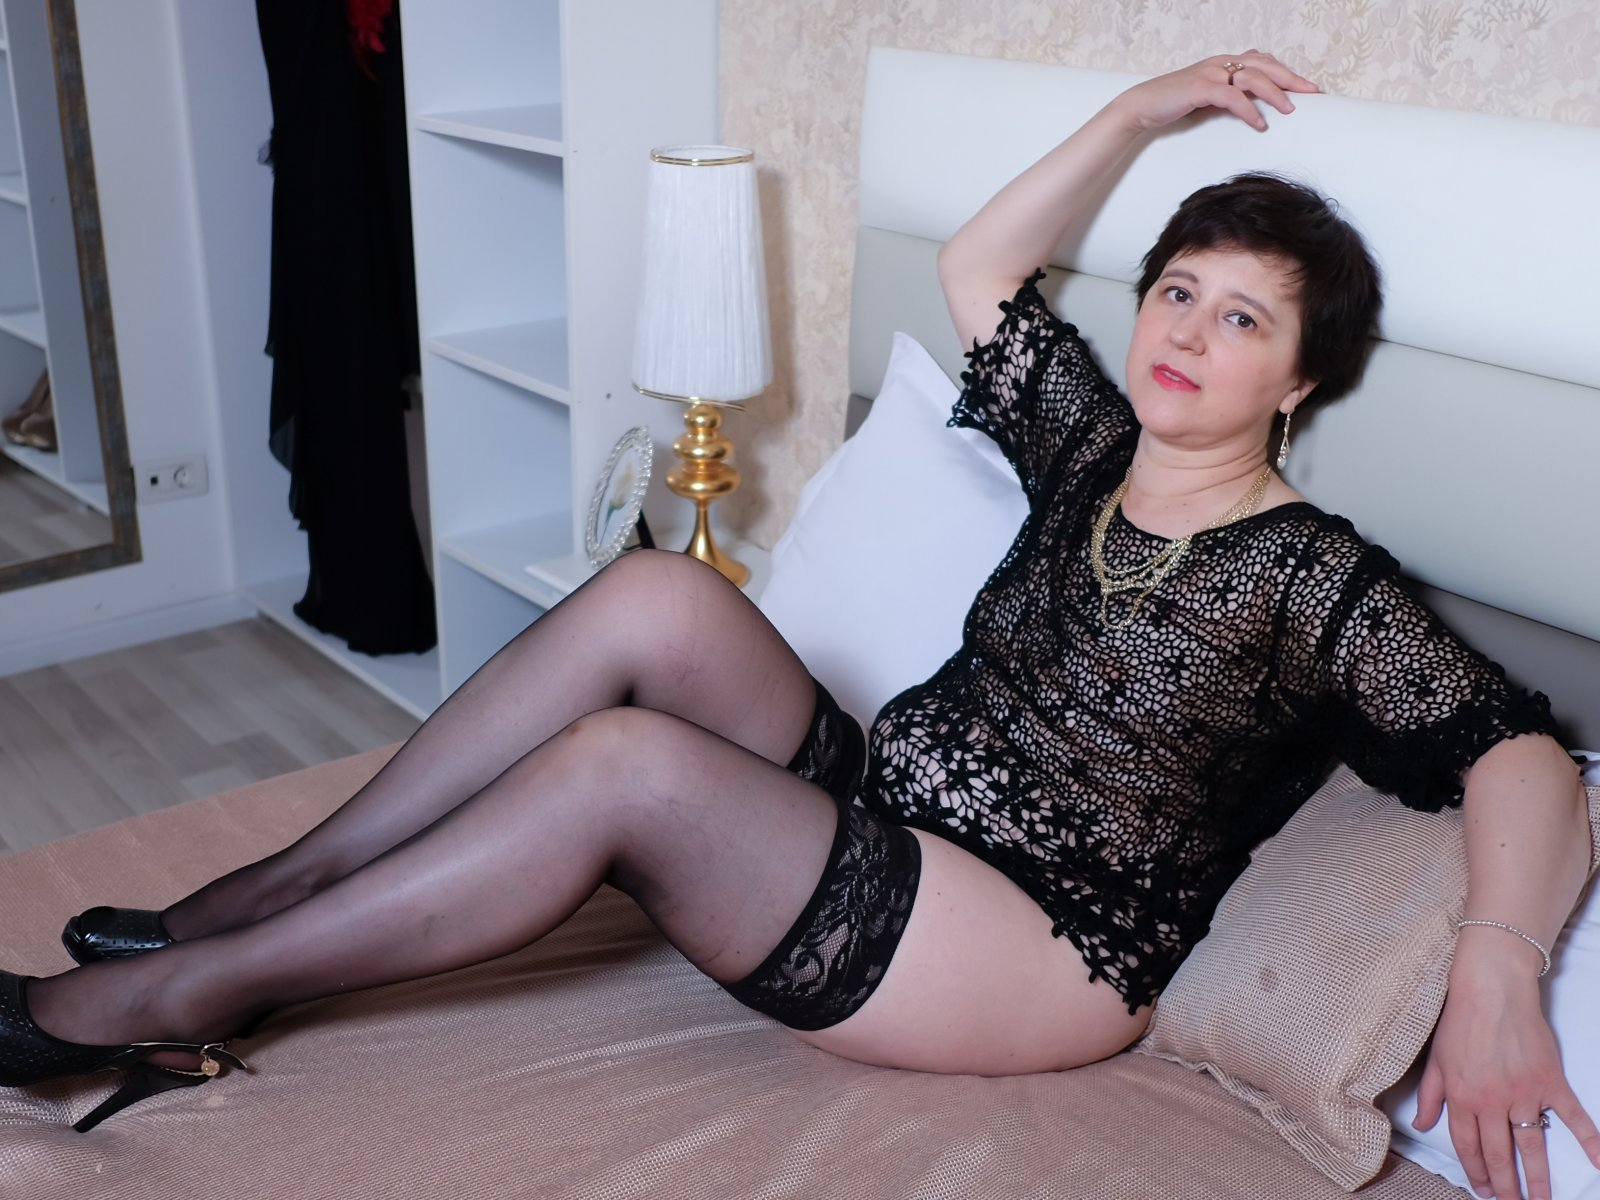 Трахаются кровати ебет зрелую женщину фото